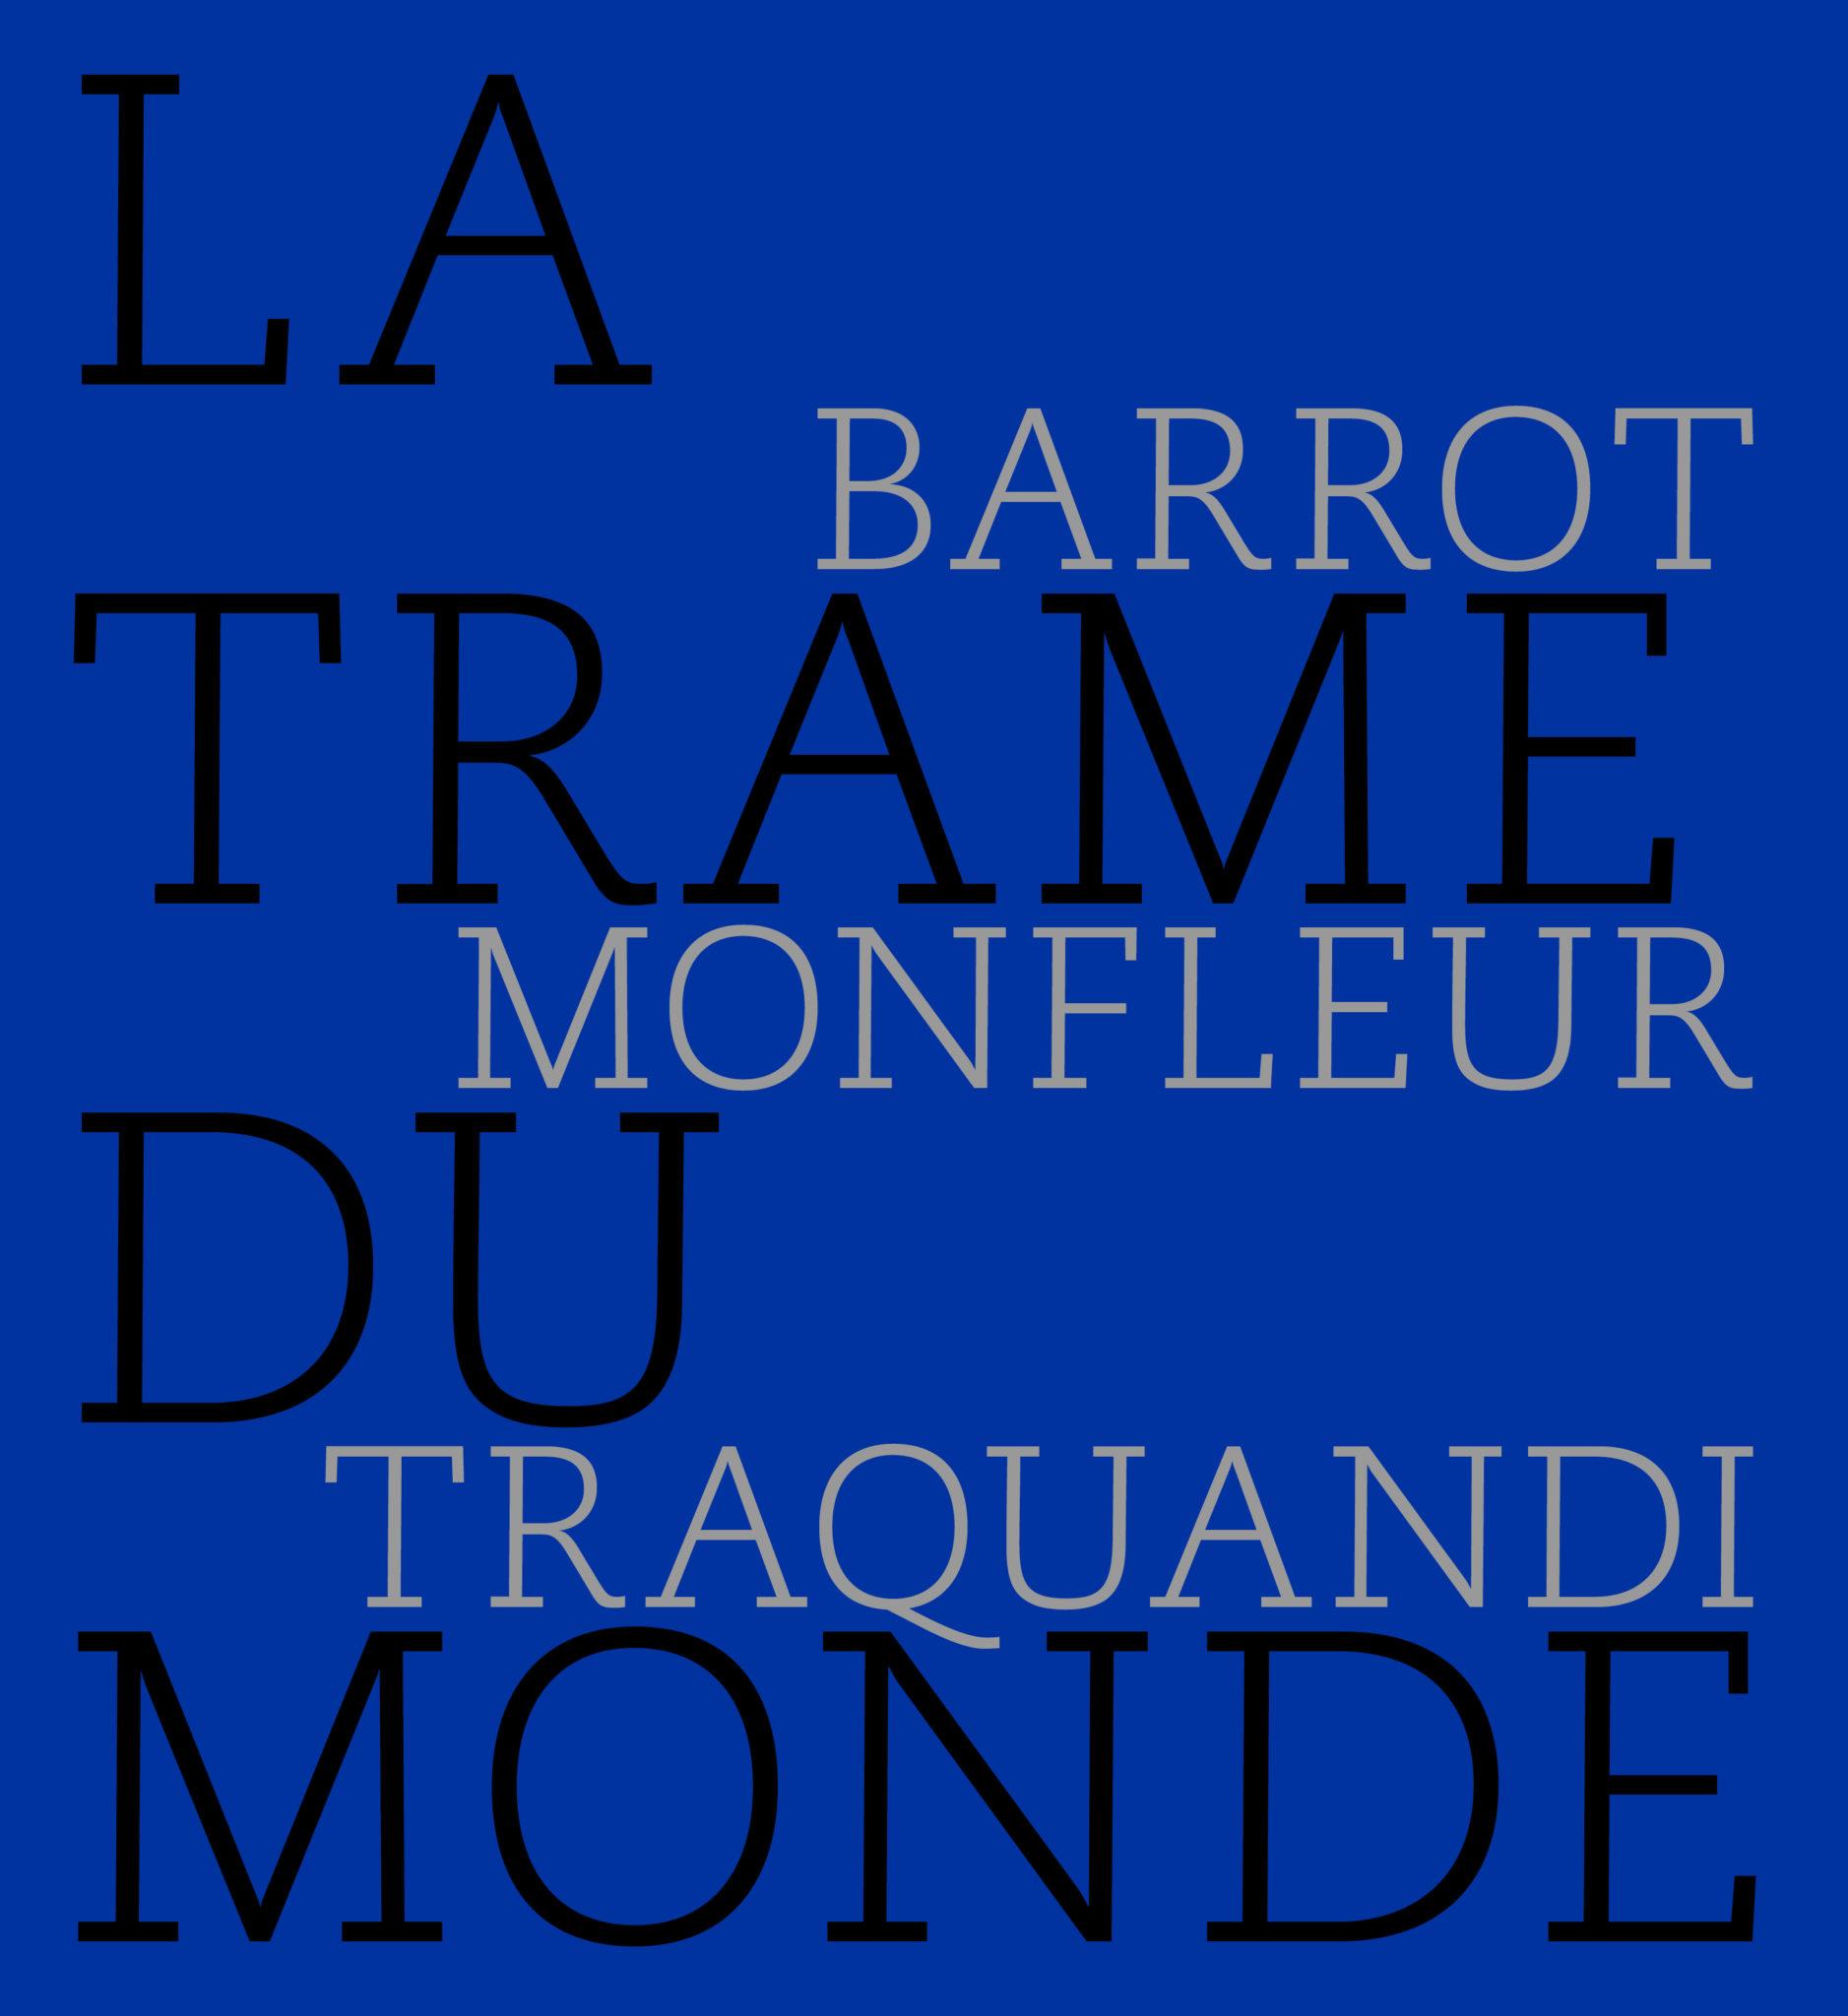 Barrot, Monfleur, Taquandi : la trame du monde